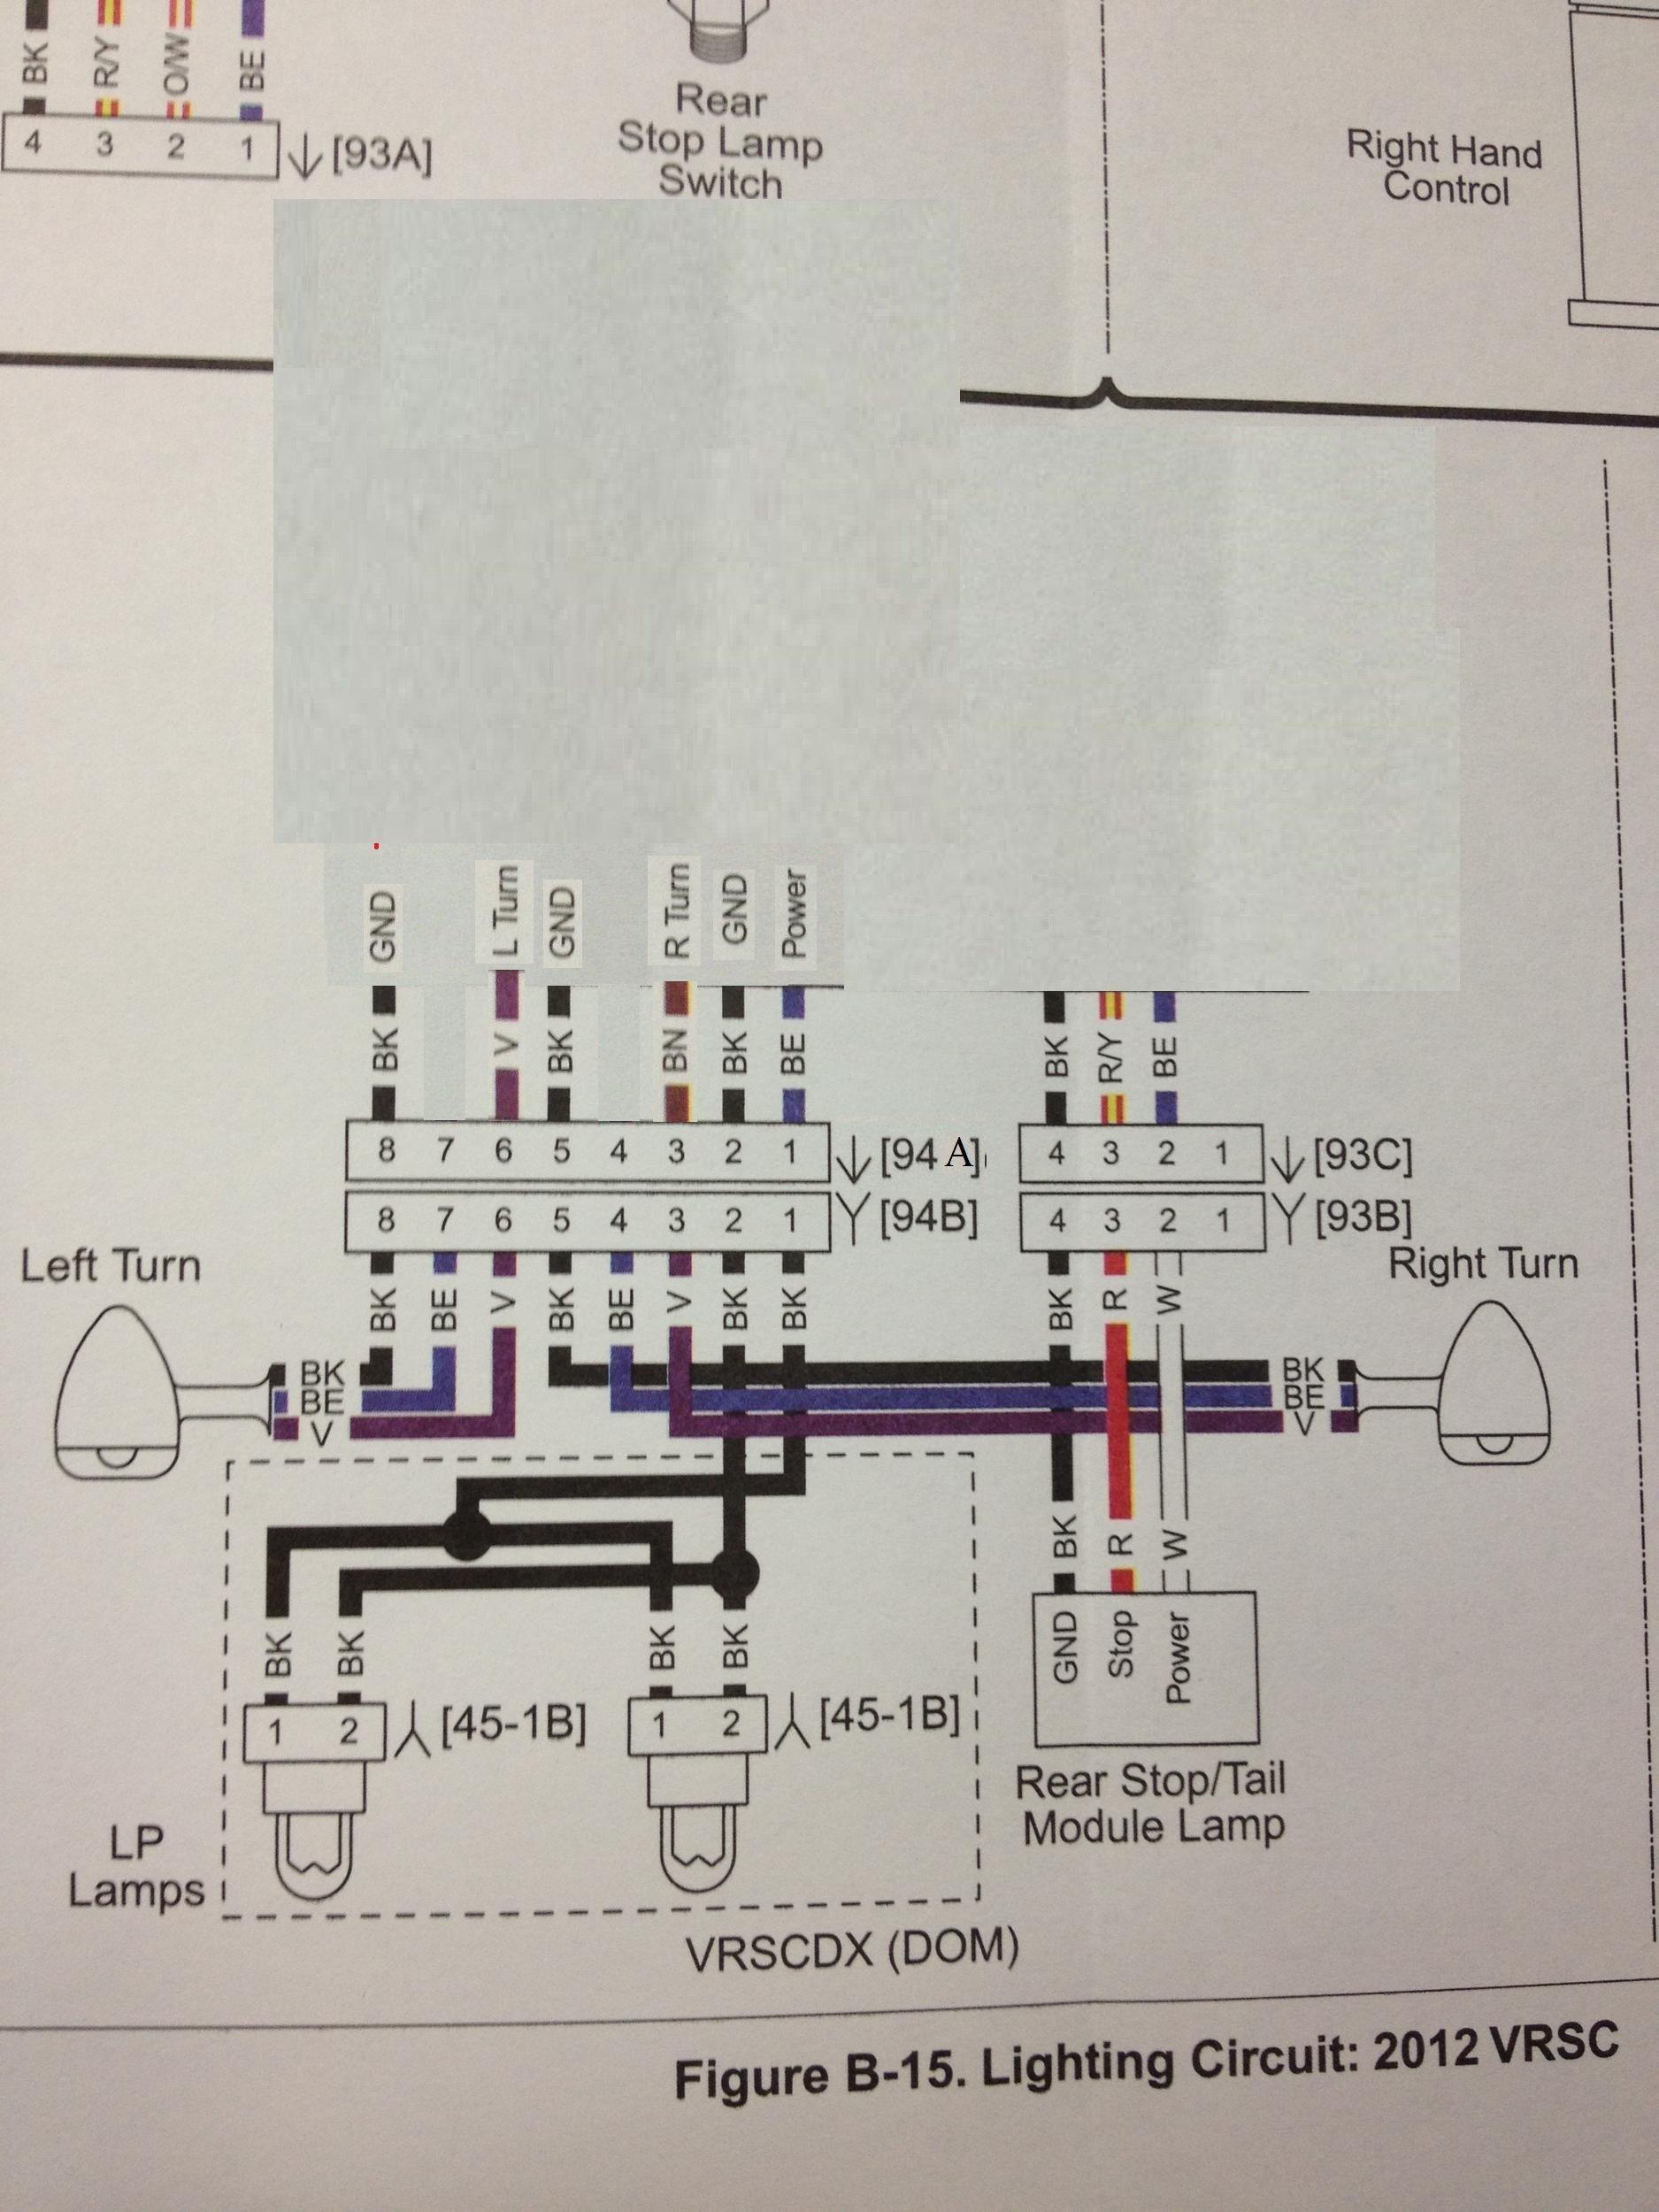 Turn Signals Rewire | Harley Davidson V-Rod Forum | Turn Signal Wiring Diagram Harley |  | V-Rod Forum